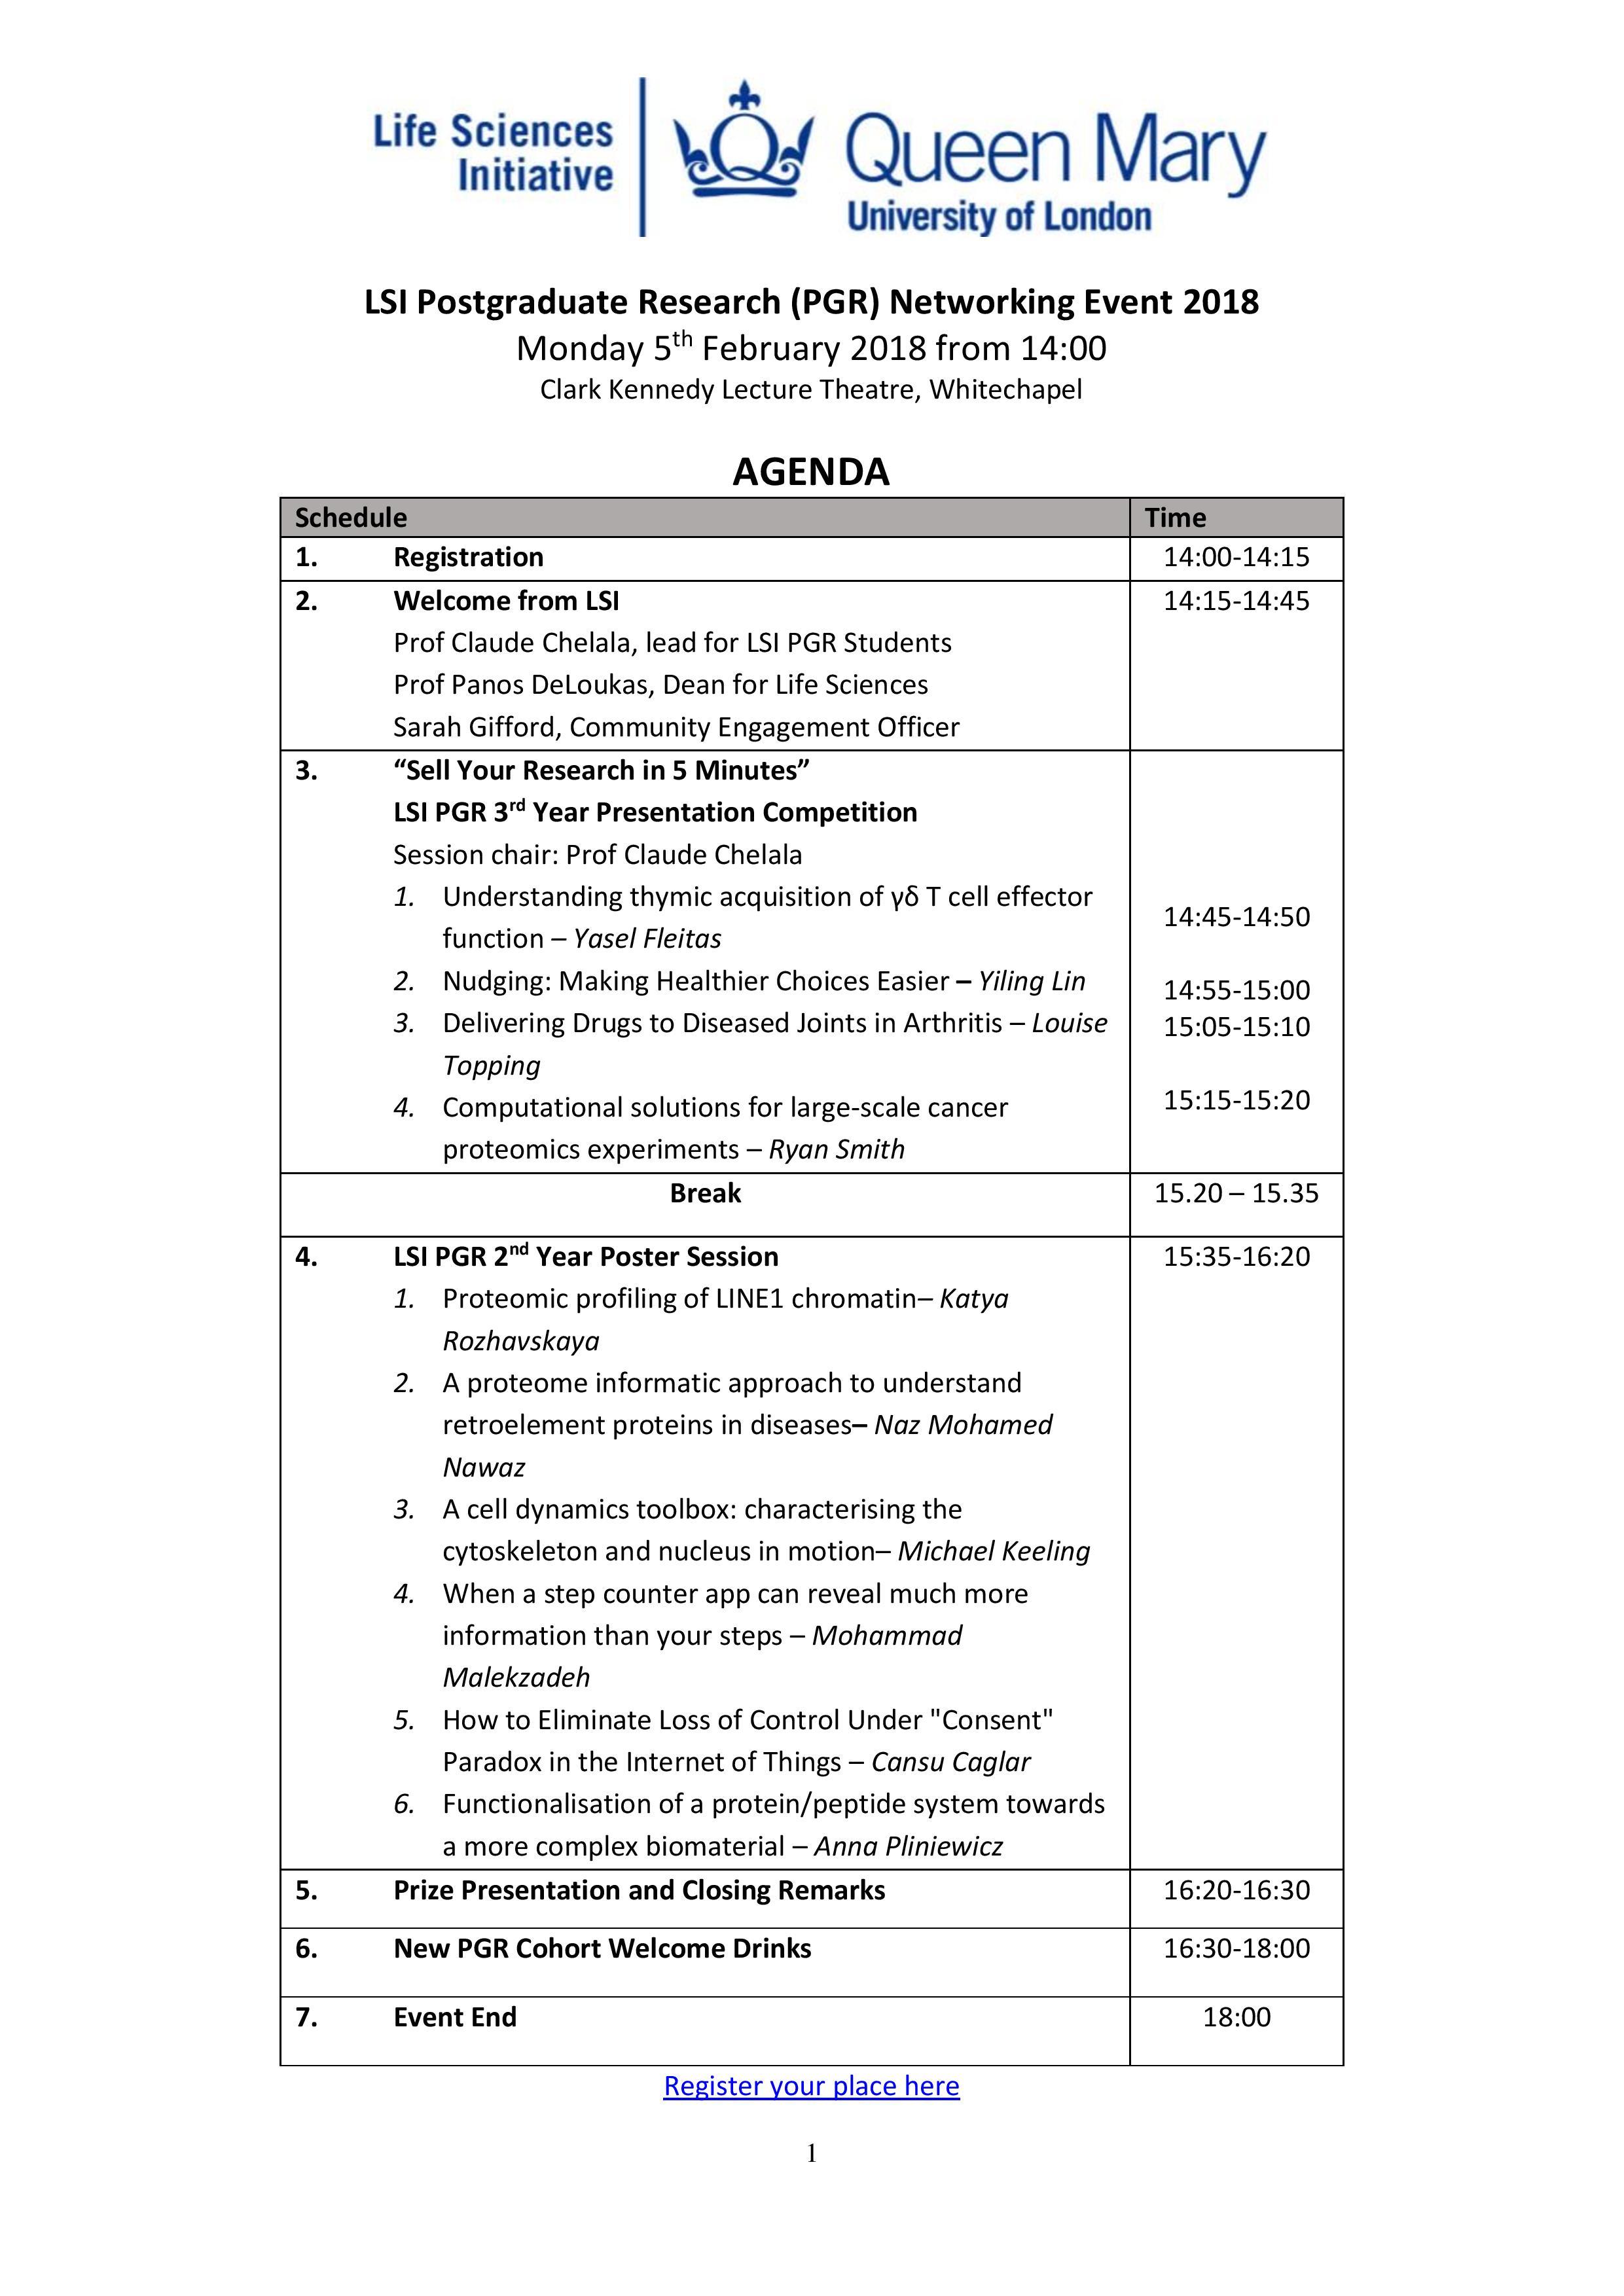 LSI PGR Networking Event Agenda